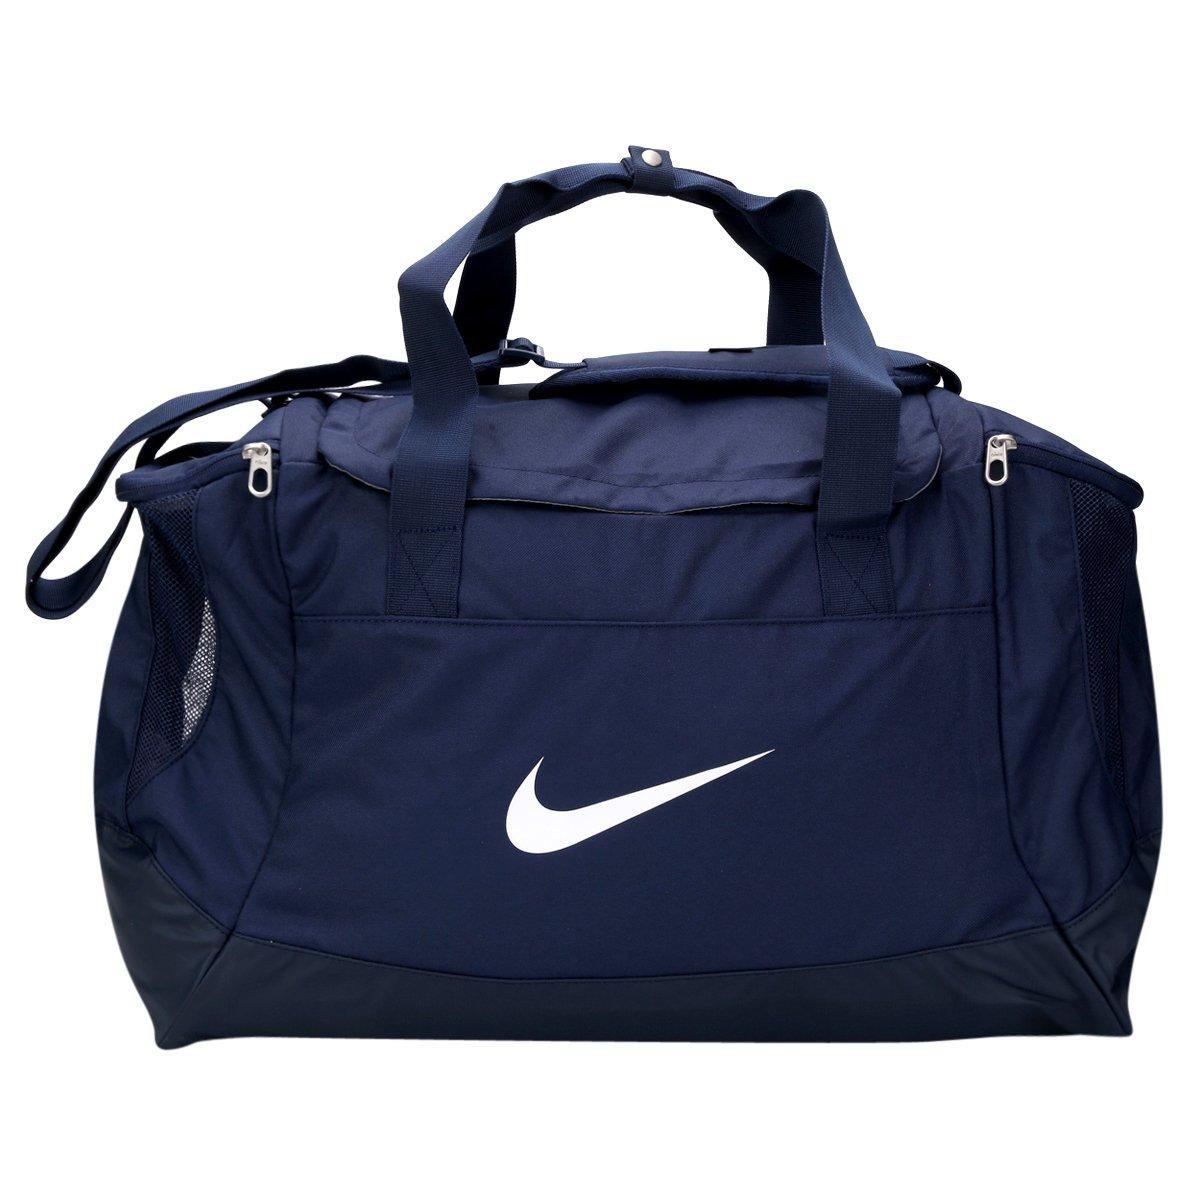 09d5fbc68 Bolsa Nike Club Team Swoosh Duff M - Compre Agora   Netshoes